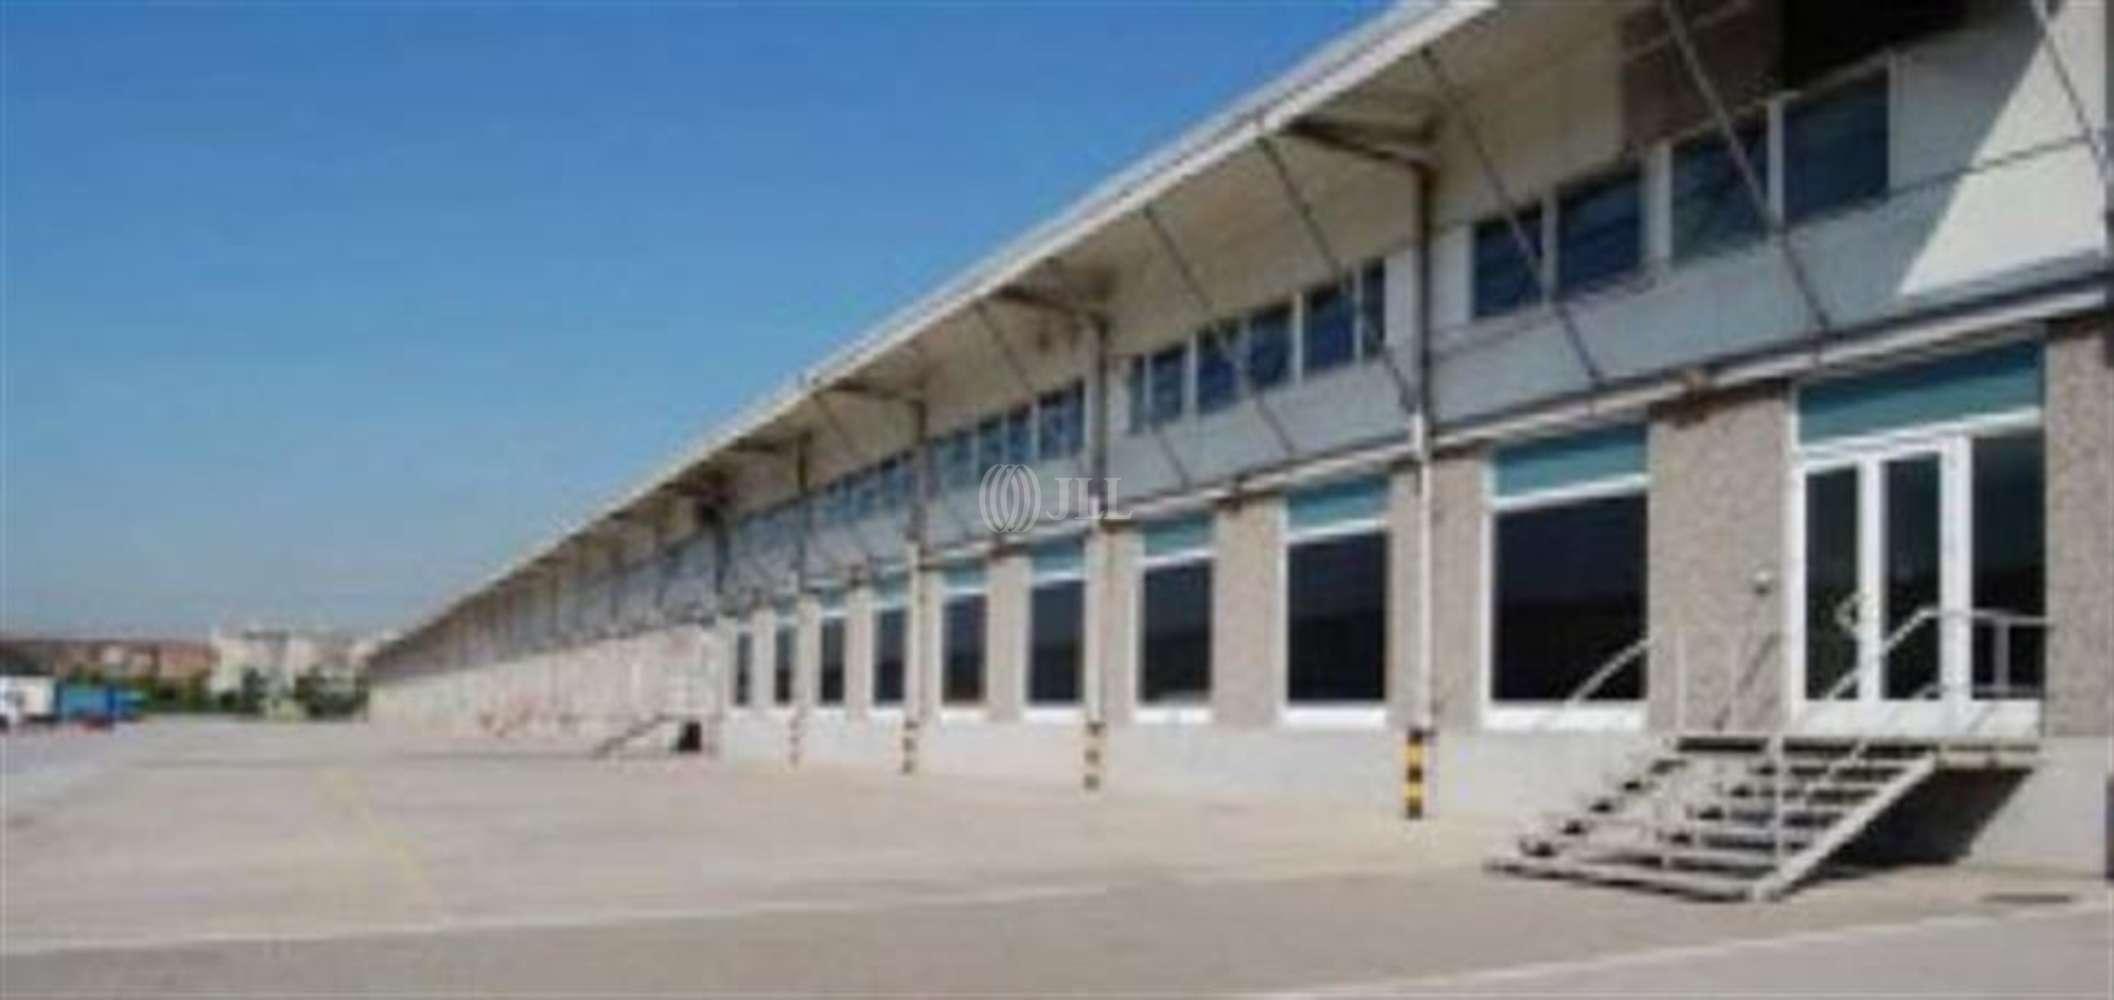 Naves industriales y logísticas Santa perpètua de mogoda, 08130 - Nave Logistica - B0187 - CIM VALLES - 11704